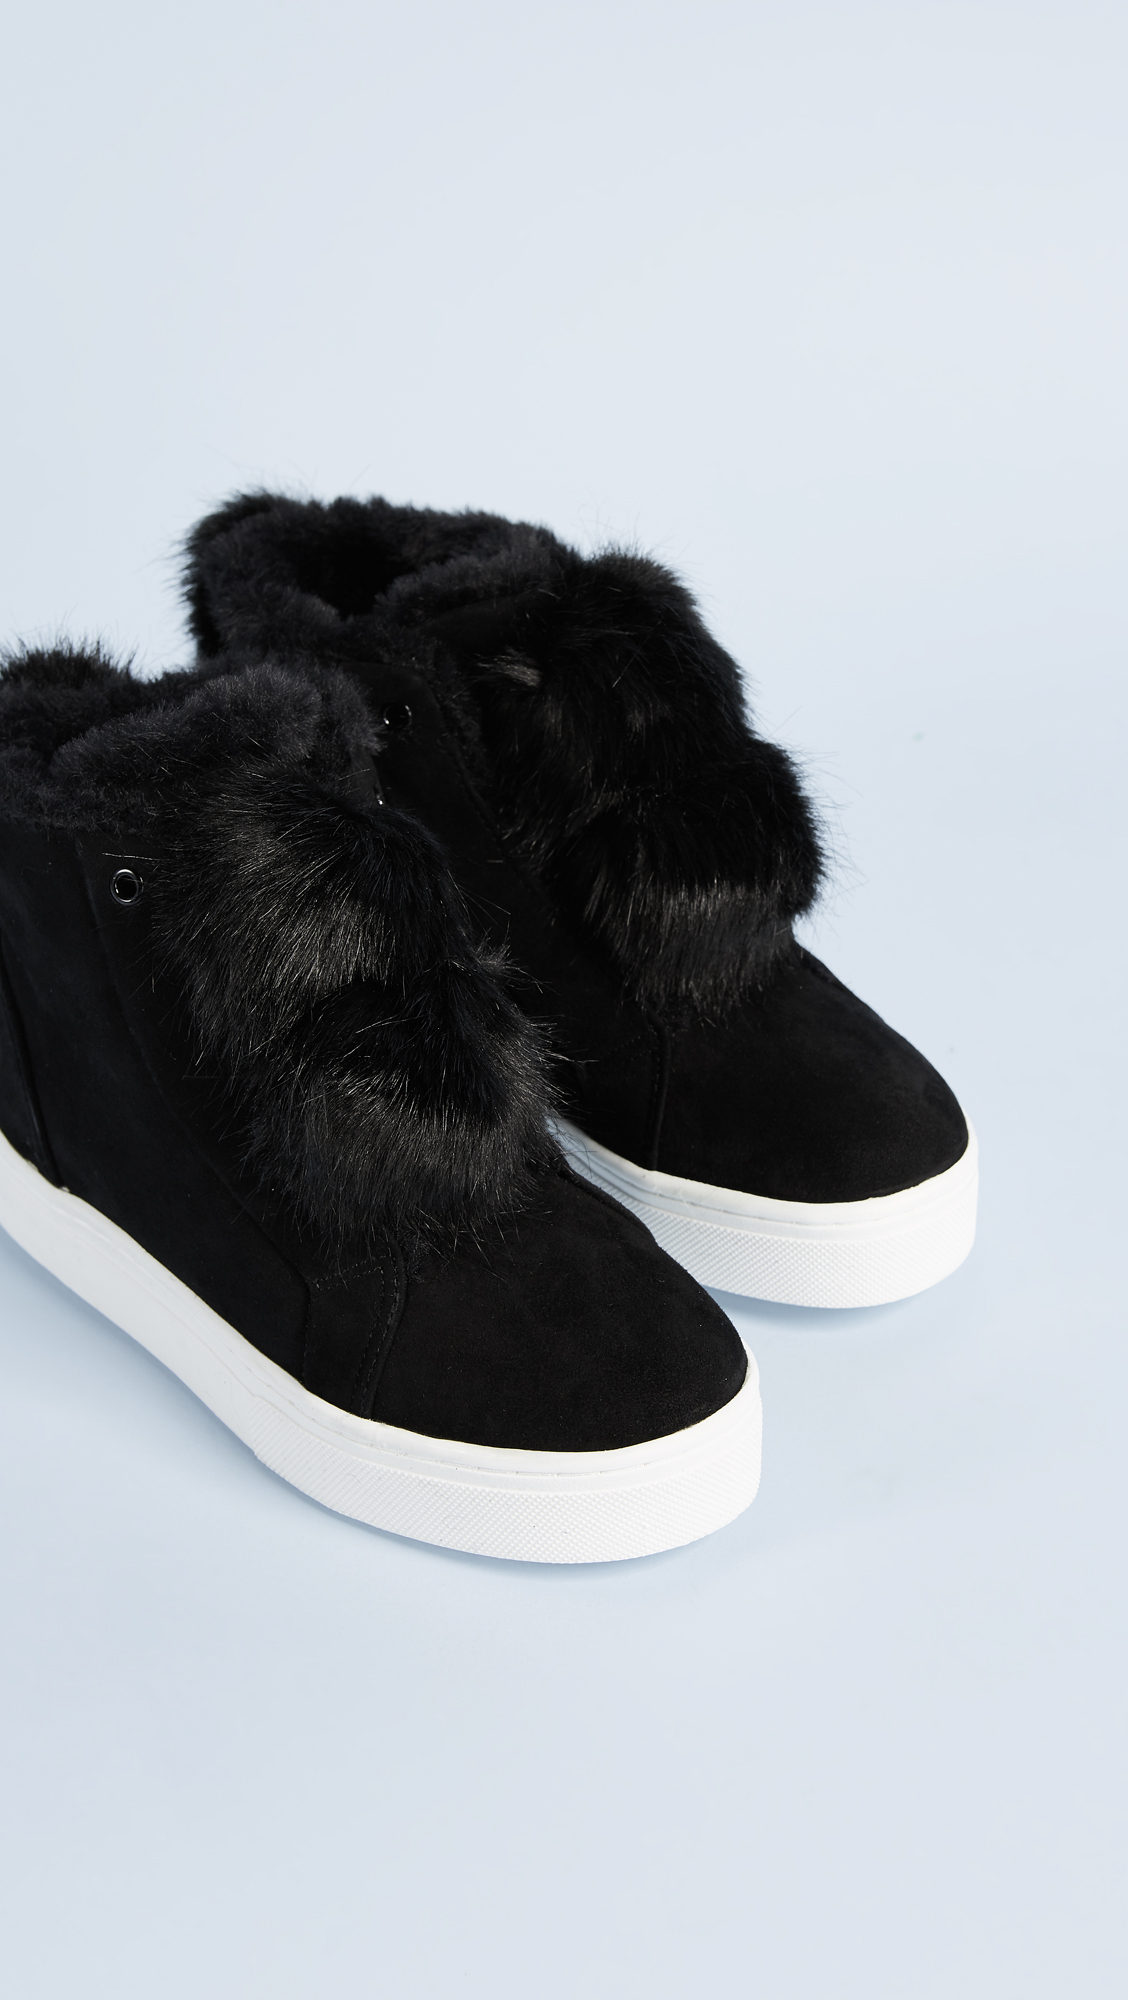 af5f36da8 Sam Edelman Lear Sneaker Booties